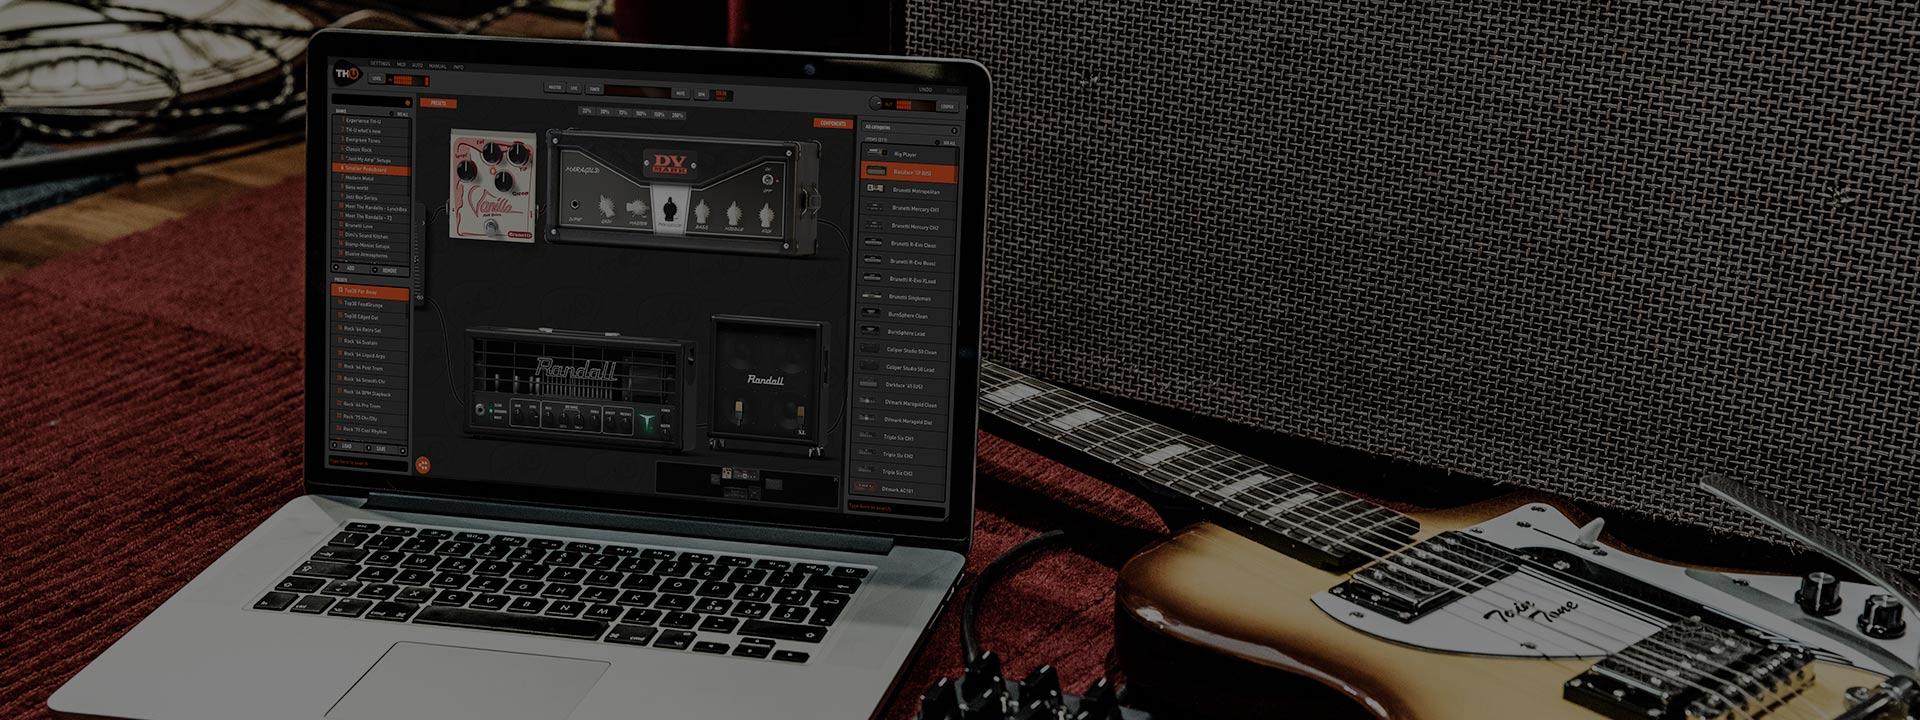 Overloud TH U Complete Mac 破解版 吉他谱曲软件-麦氪派(WaitsUn.com | 爱情守望者)